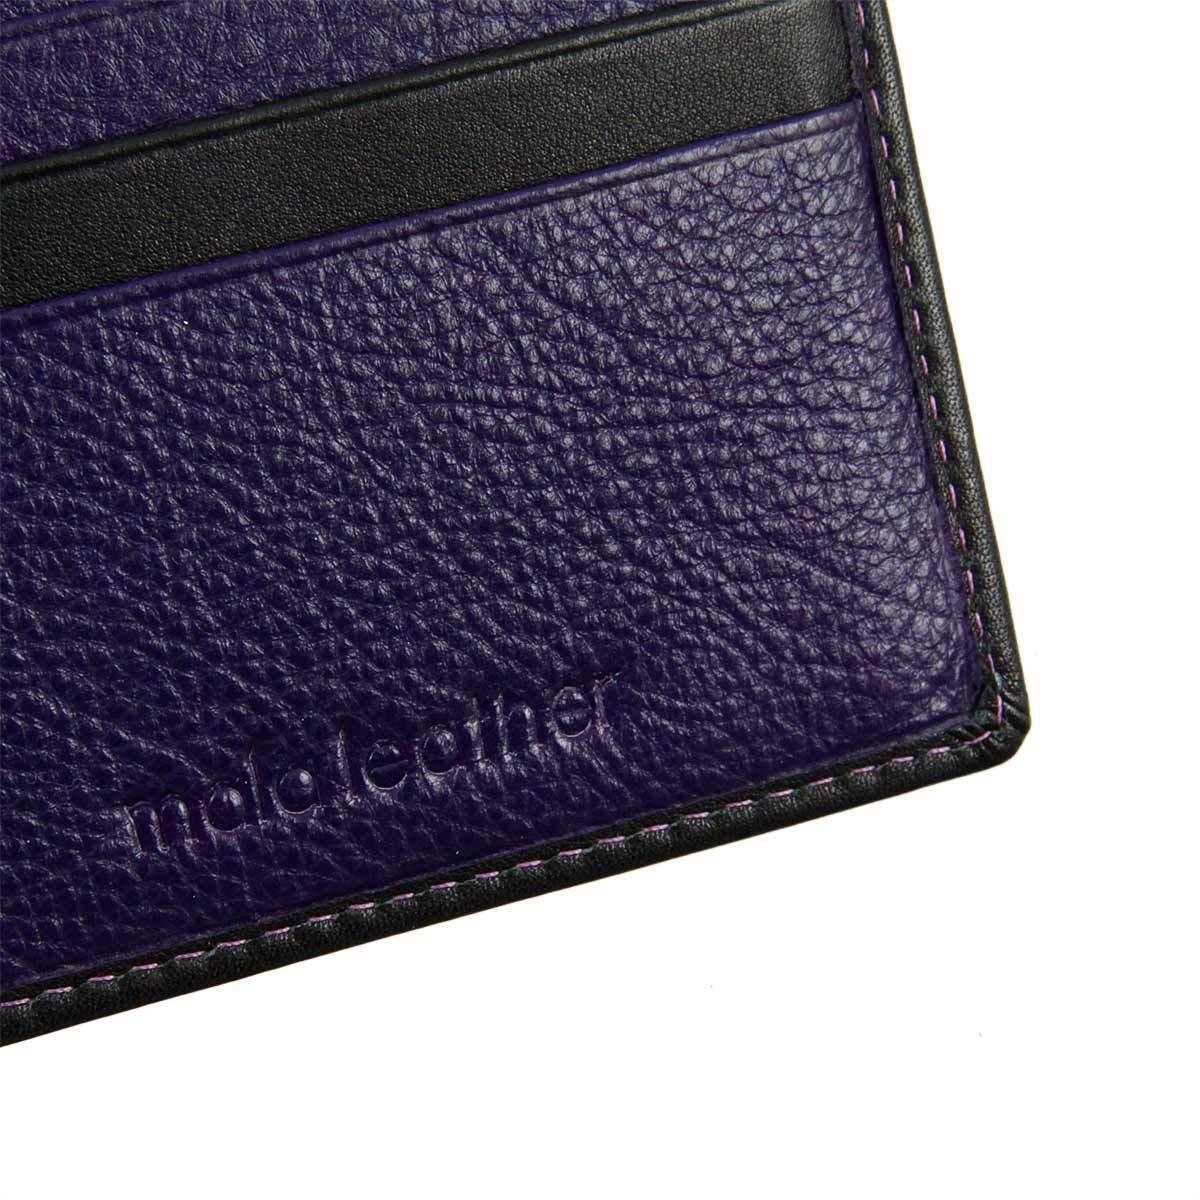 Fine Leather Two Tone Colour Interior 3 Colour Choices Slim Leather Wallet